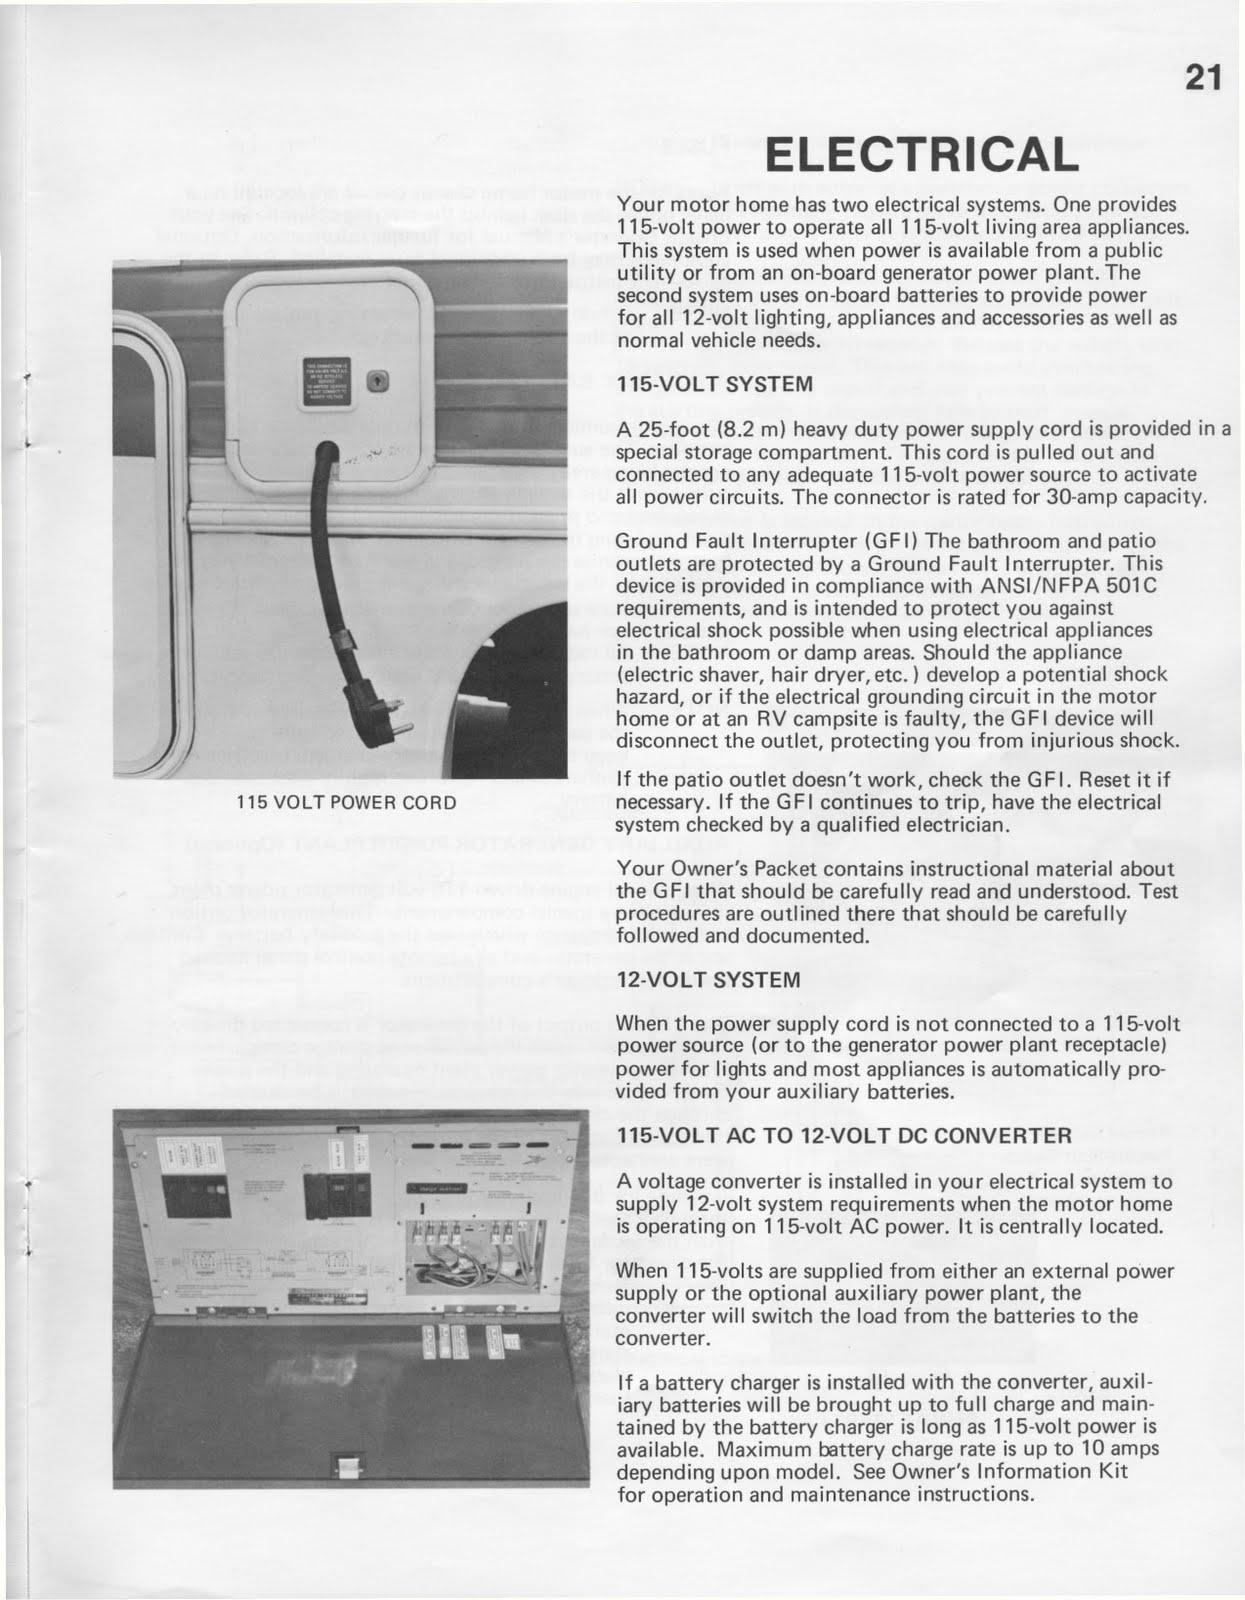 1985 pace Arrow Motorhome manual